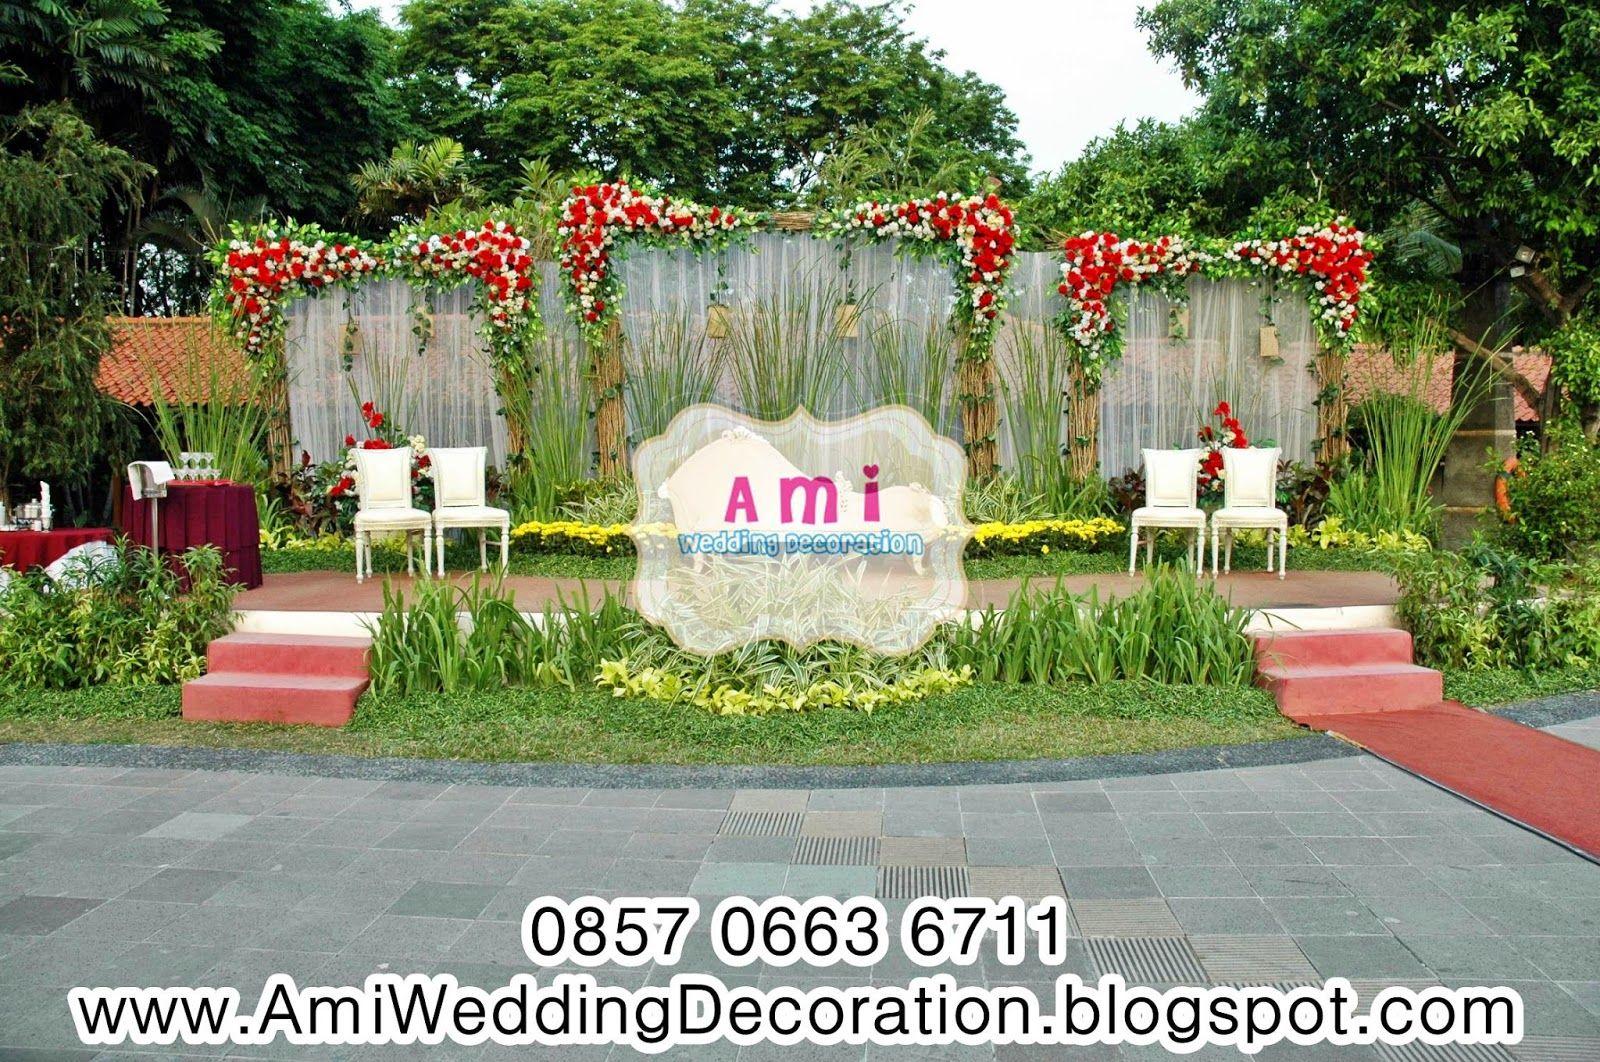 Amiweddingdecoration2cdekorasipernikahansurabayamurah amiweddingdecoration2cdekorasipernikahansurabayamurah junglespirit Image collections